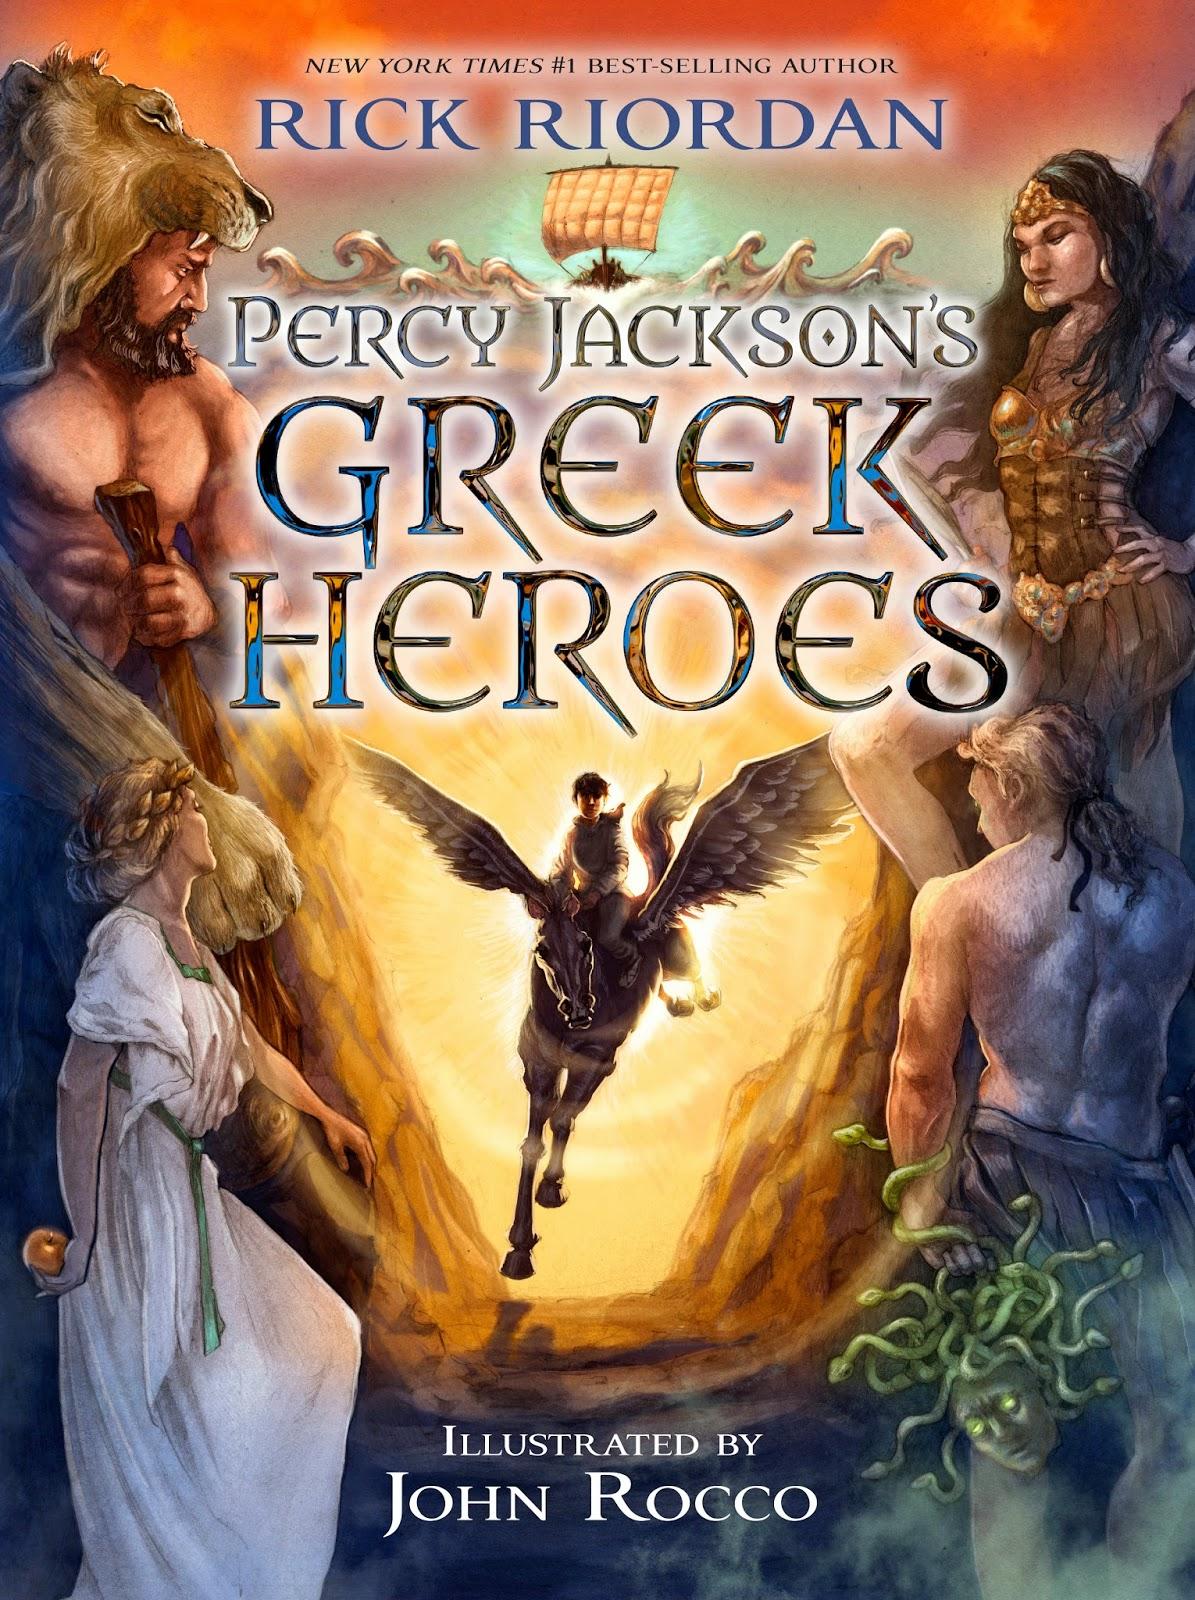 Rick Riordan Has Written a New Percy Jackson Companion Book | Children ...